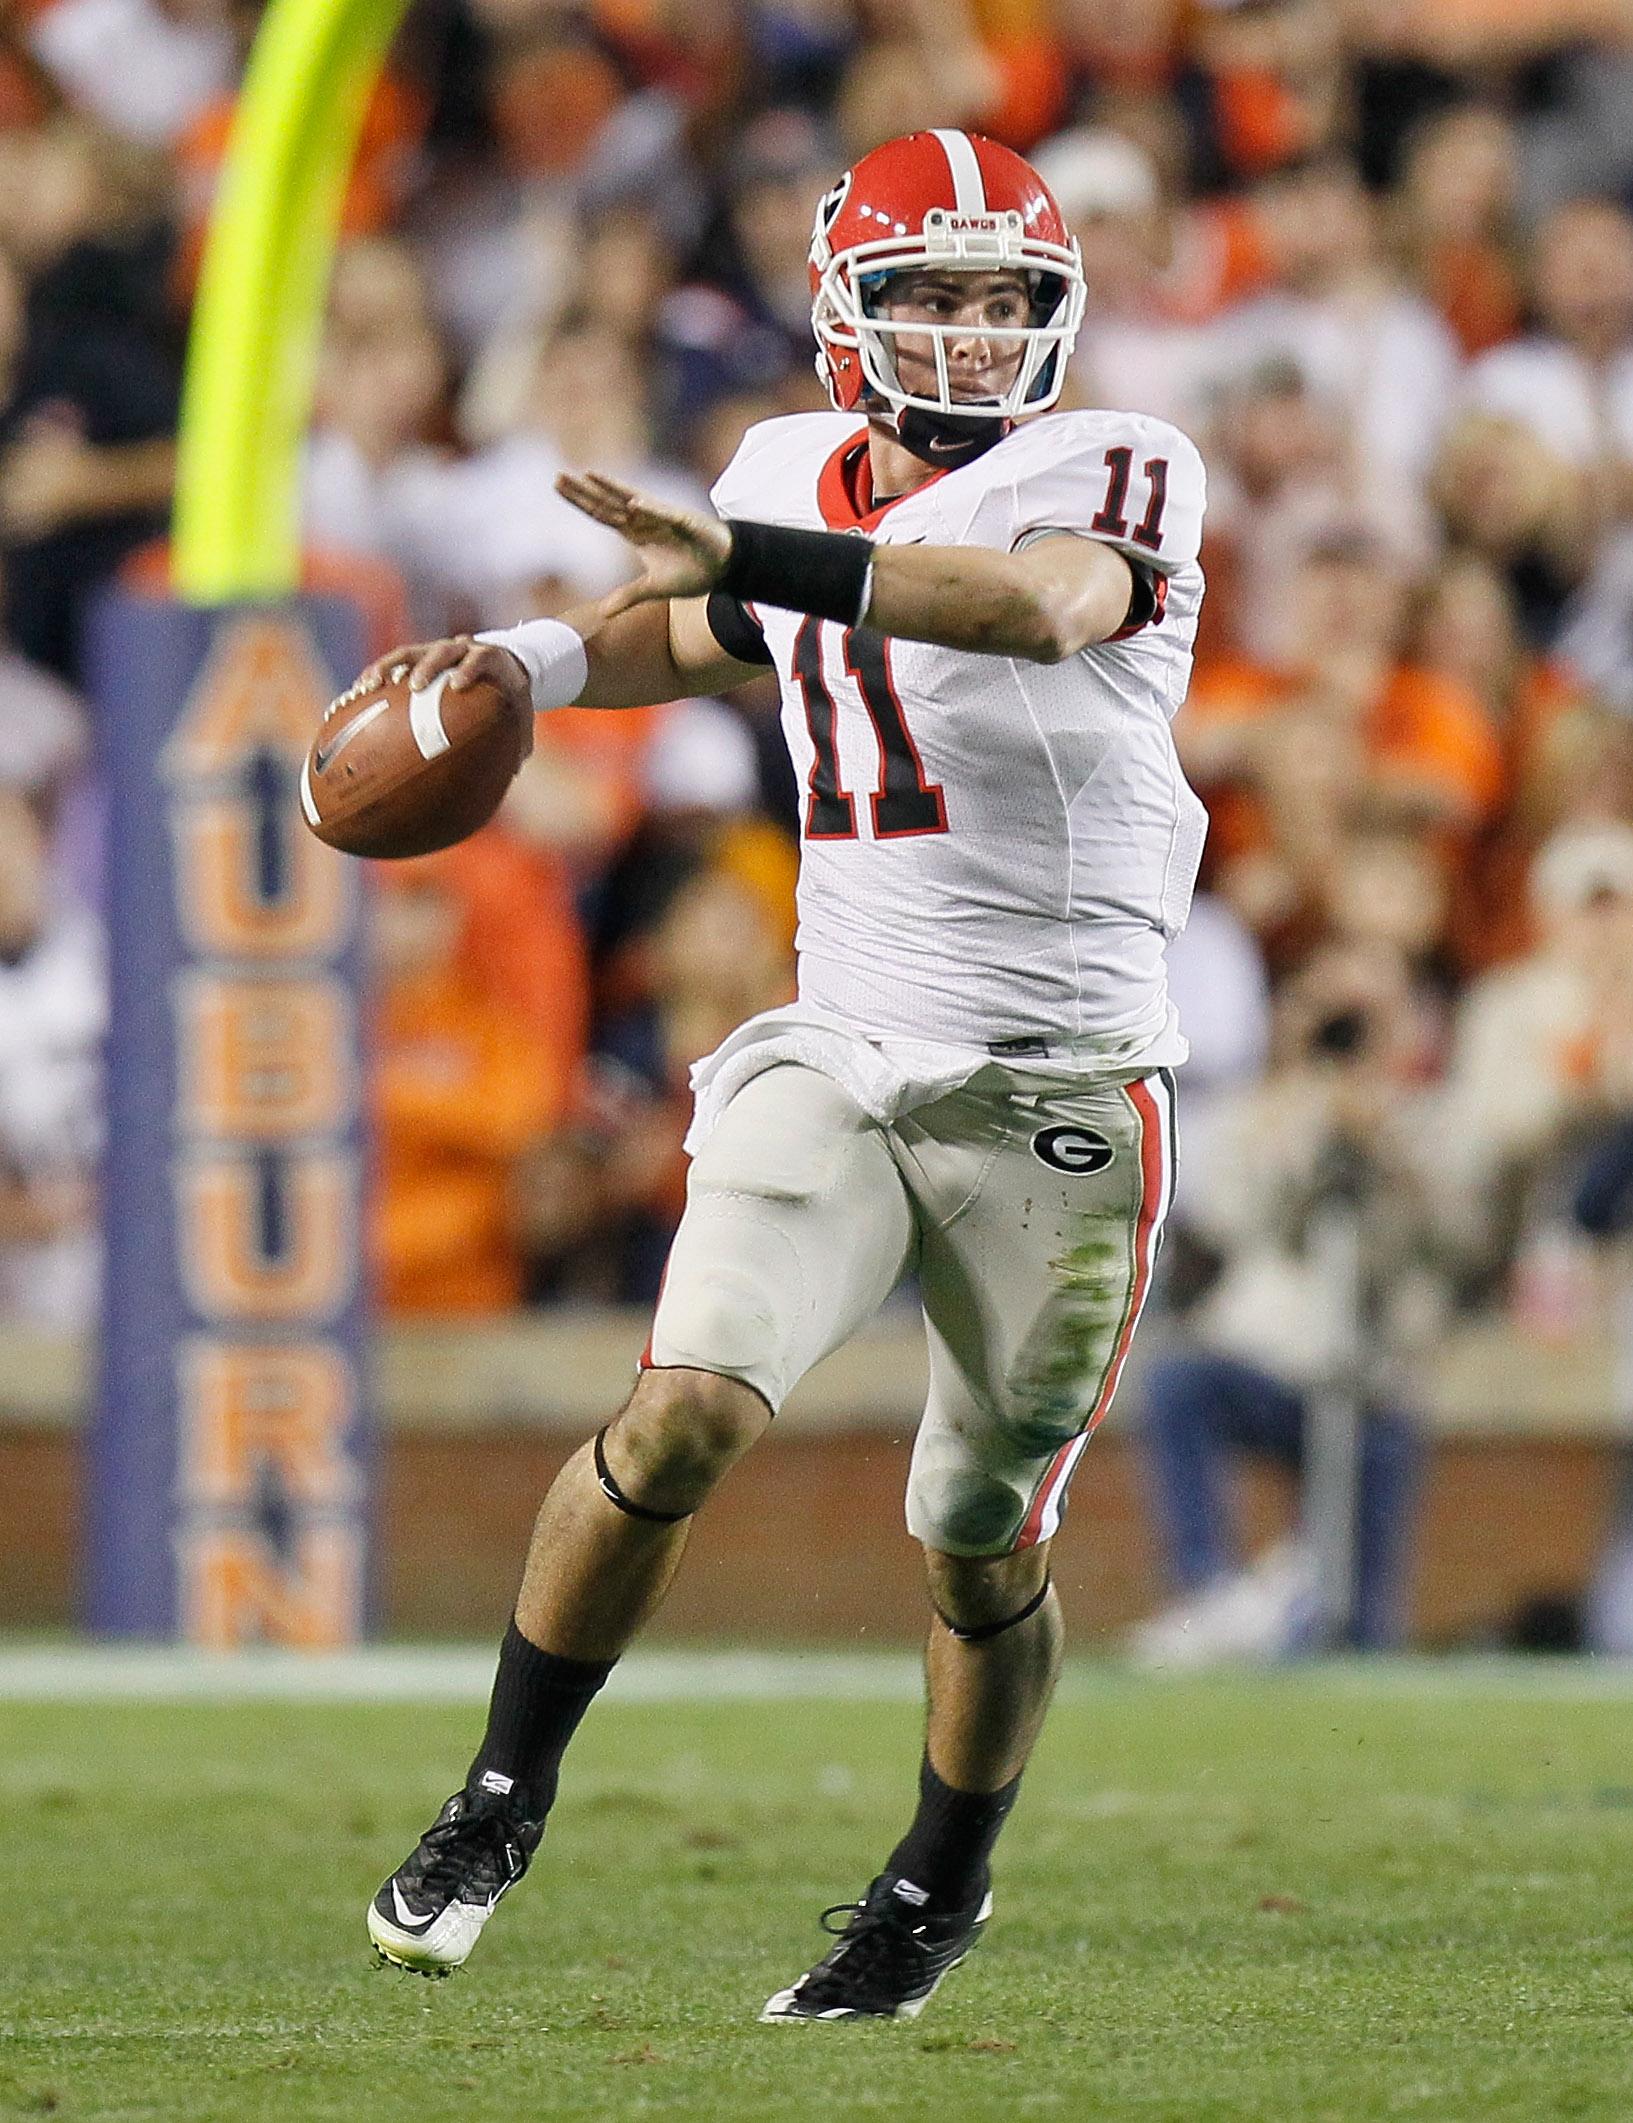 Aaron Murray is the SEC's top quarterback heading in 2011.